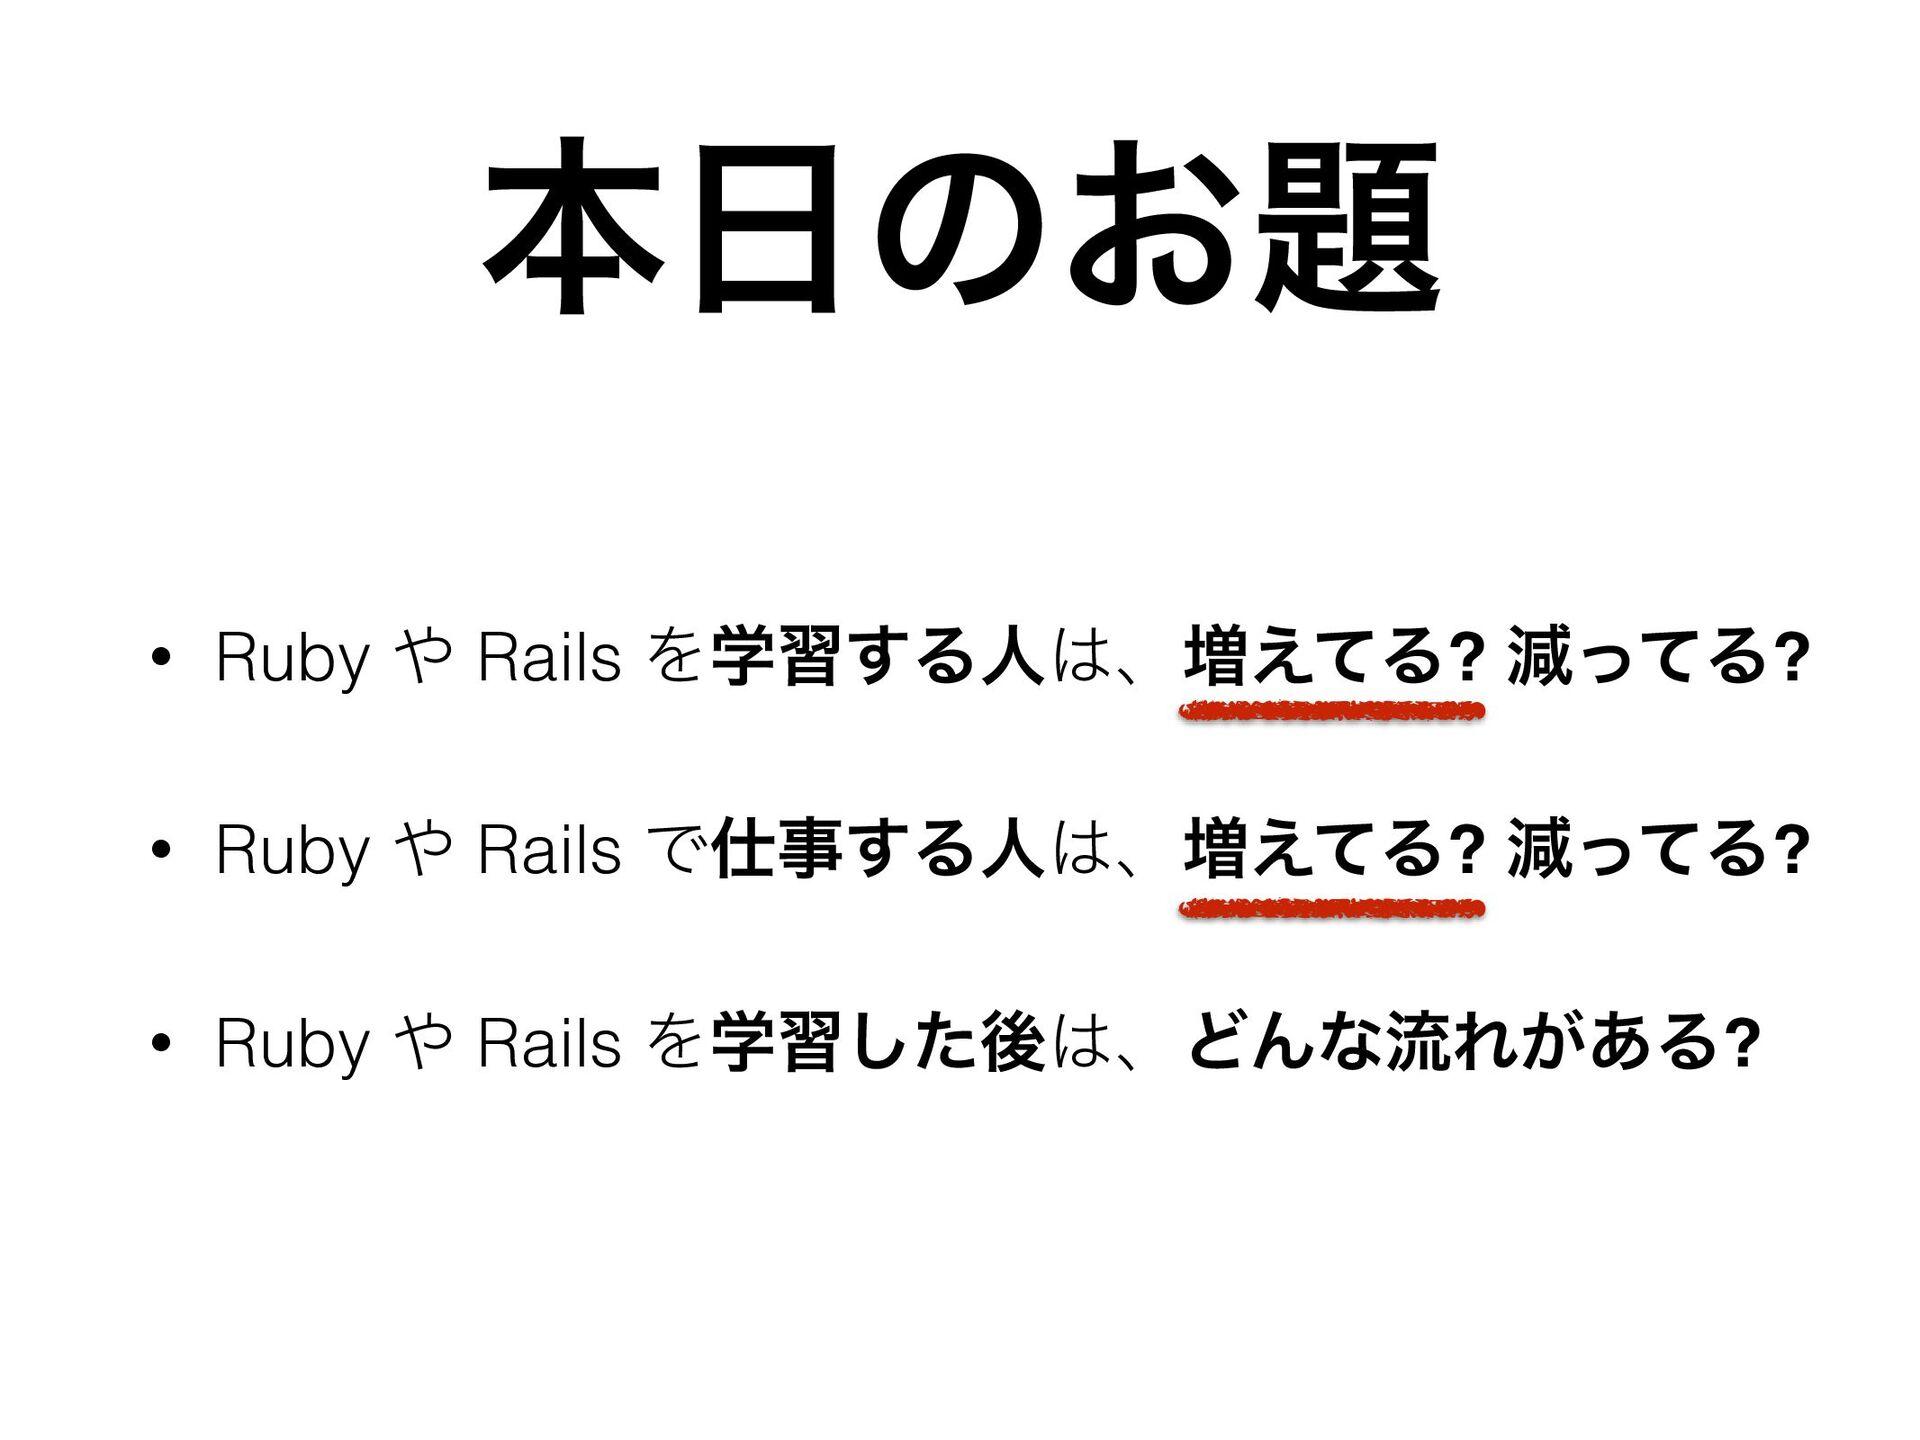 Ͱ͖ͦ͏ͳϙΠϯτ • Ruby/Rails ͷϢʔβʔ͕૿͑ͨͷͰͳ͘ɺ ͦͷαΠτͷ...